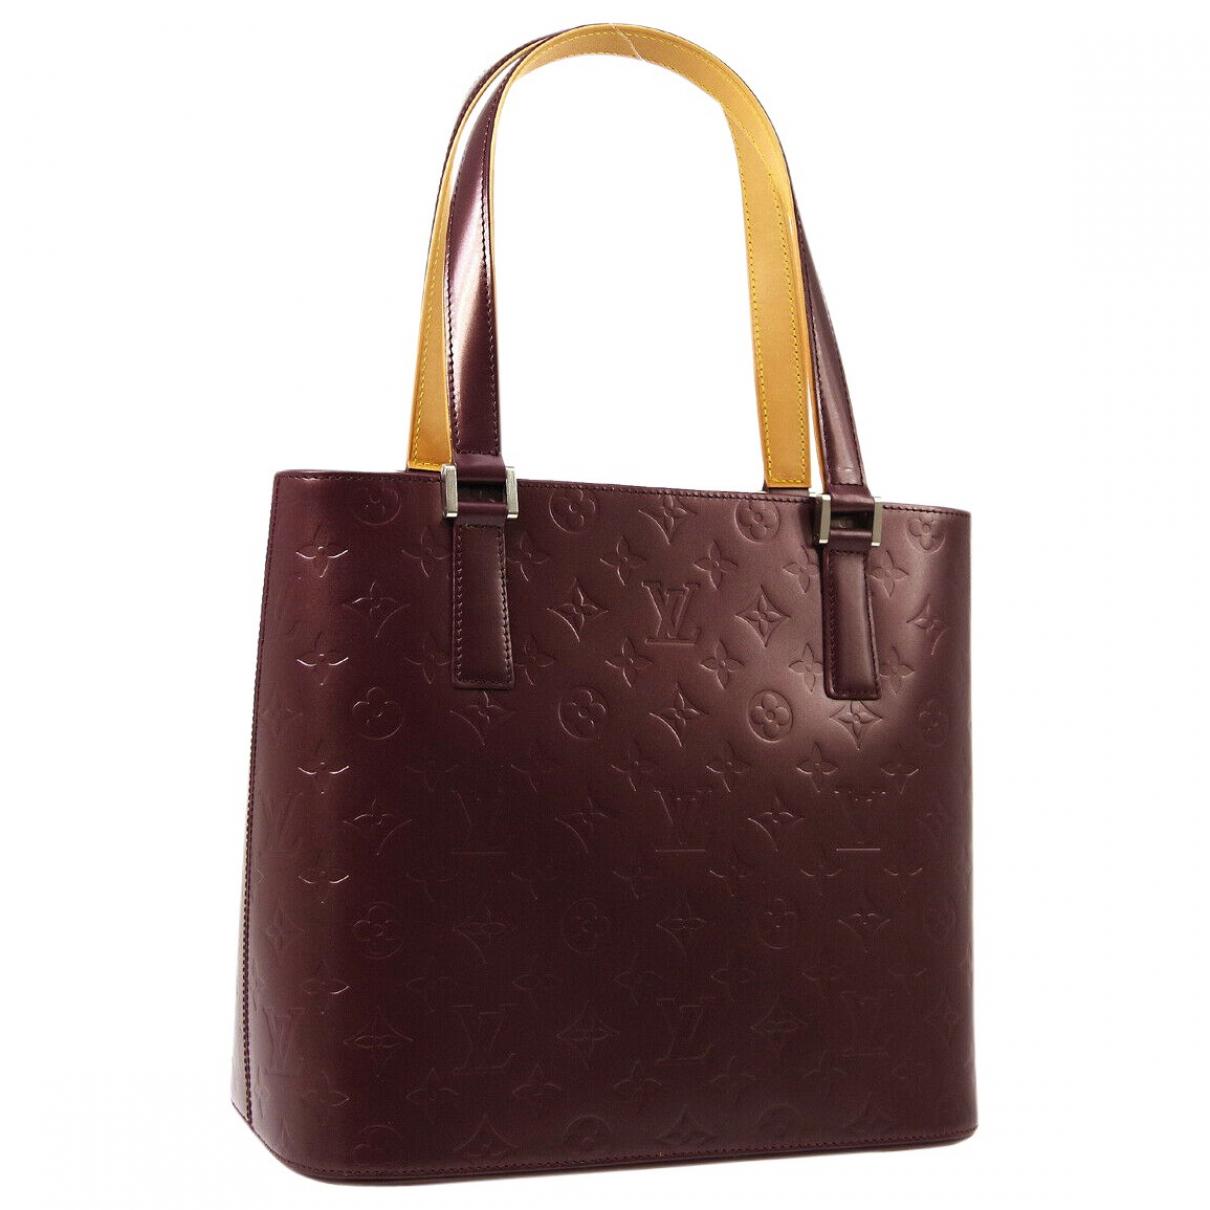 Louis Vuitton Stockton Burgundy Leather handbag for Women \N